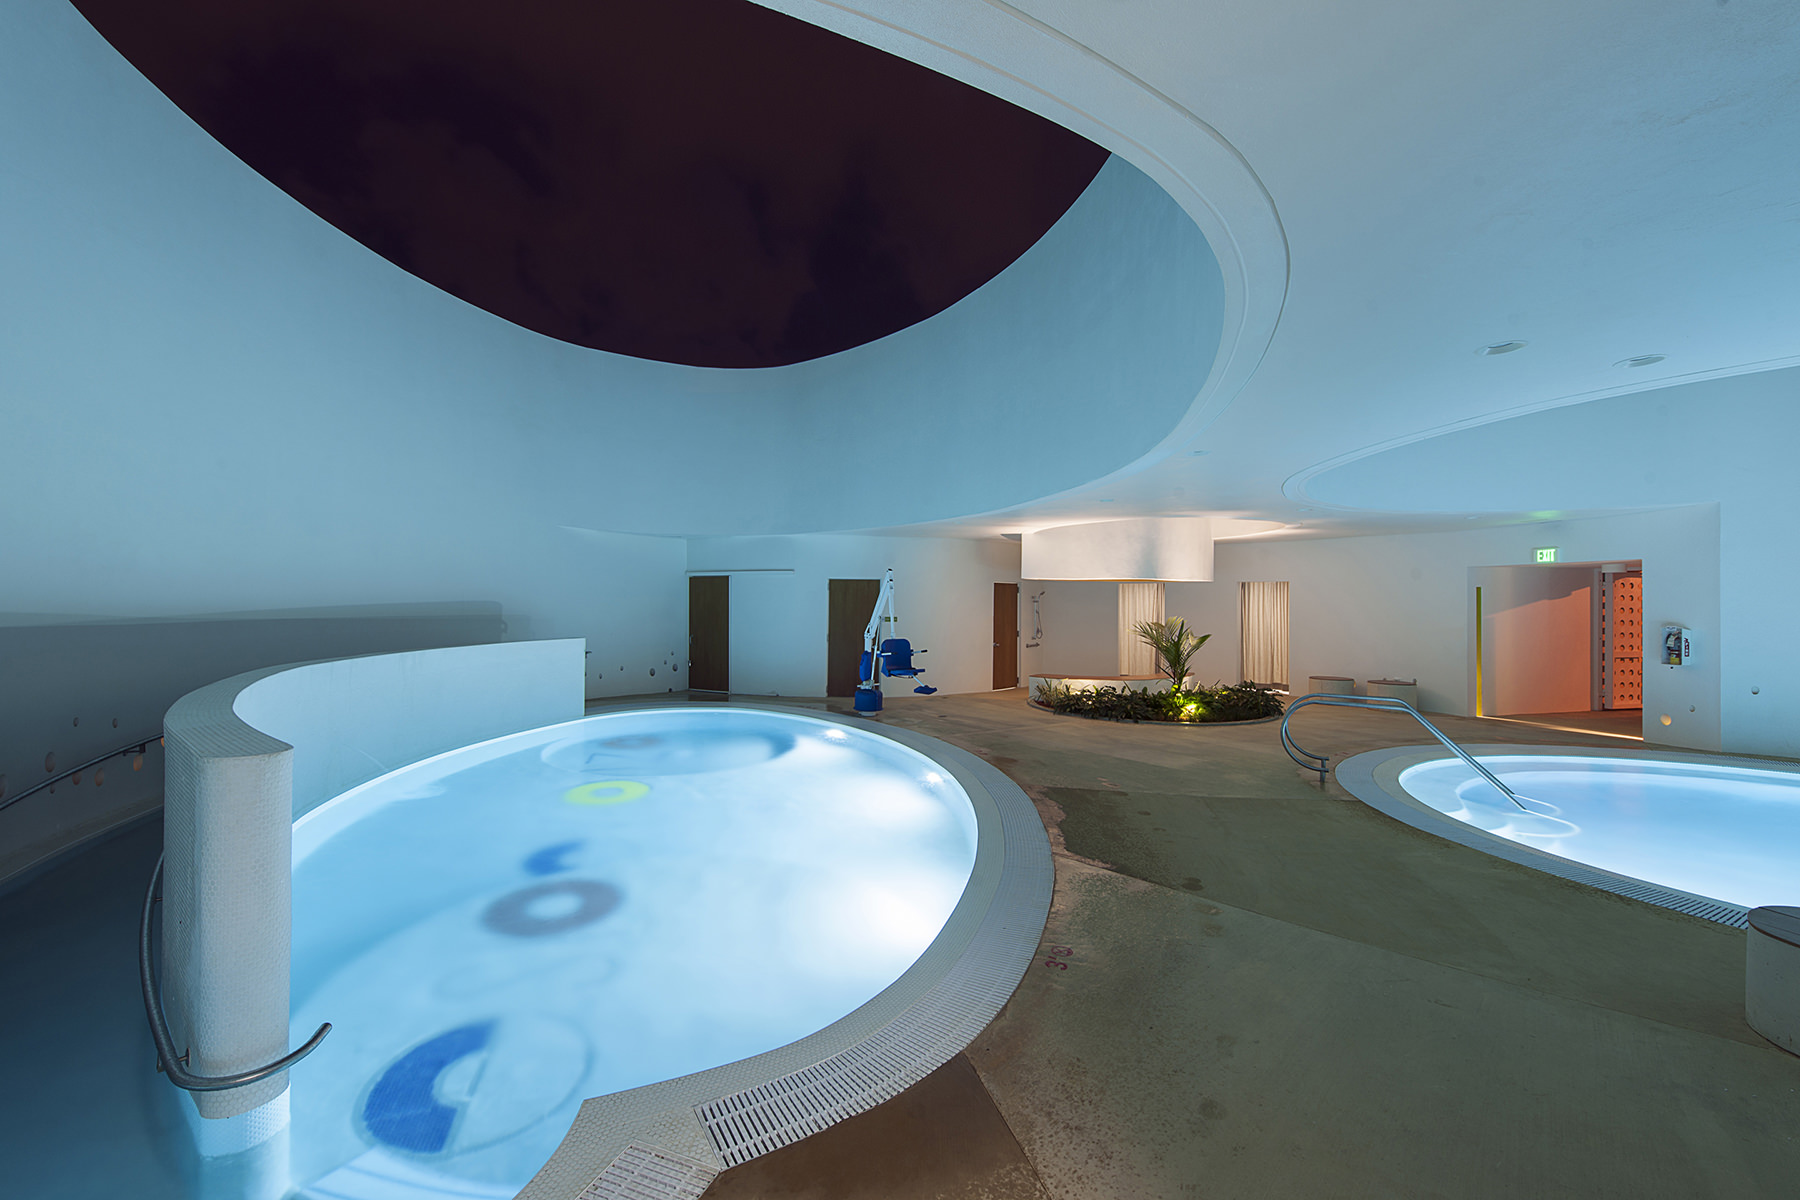 la esperanza therapeutic pools san juan interior fuster architects 2.jpg